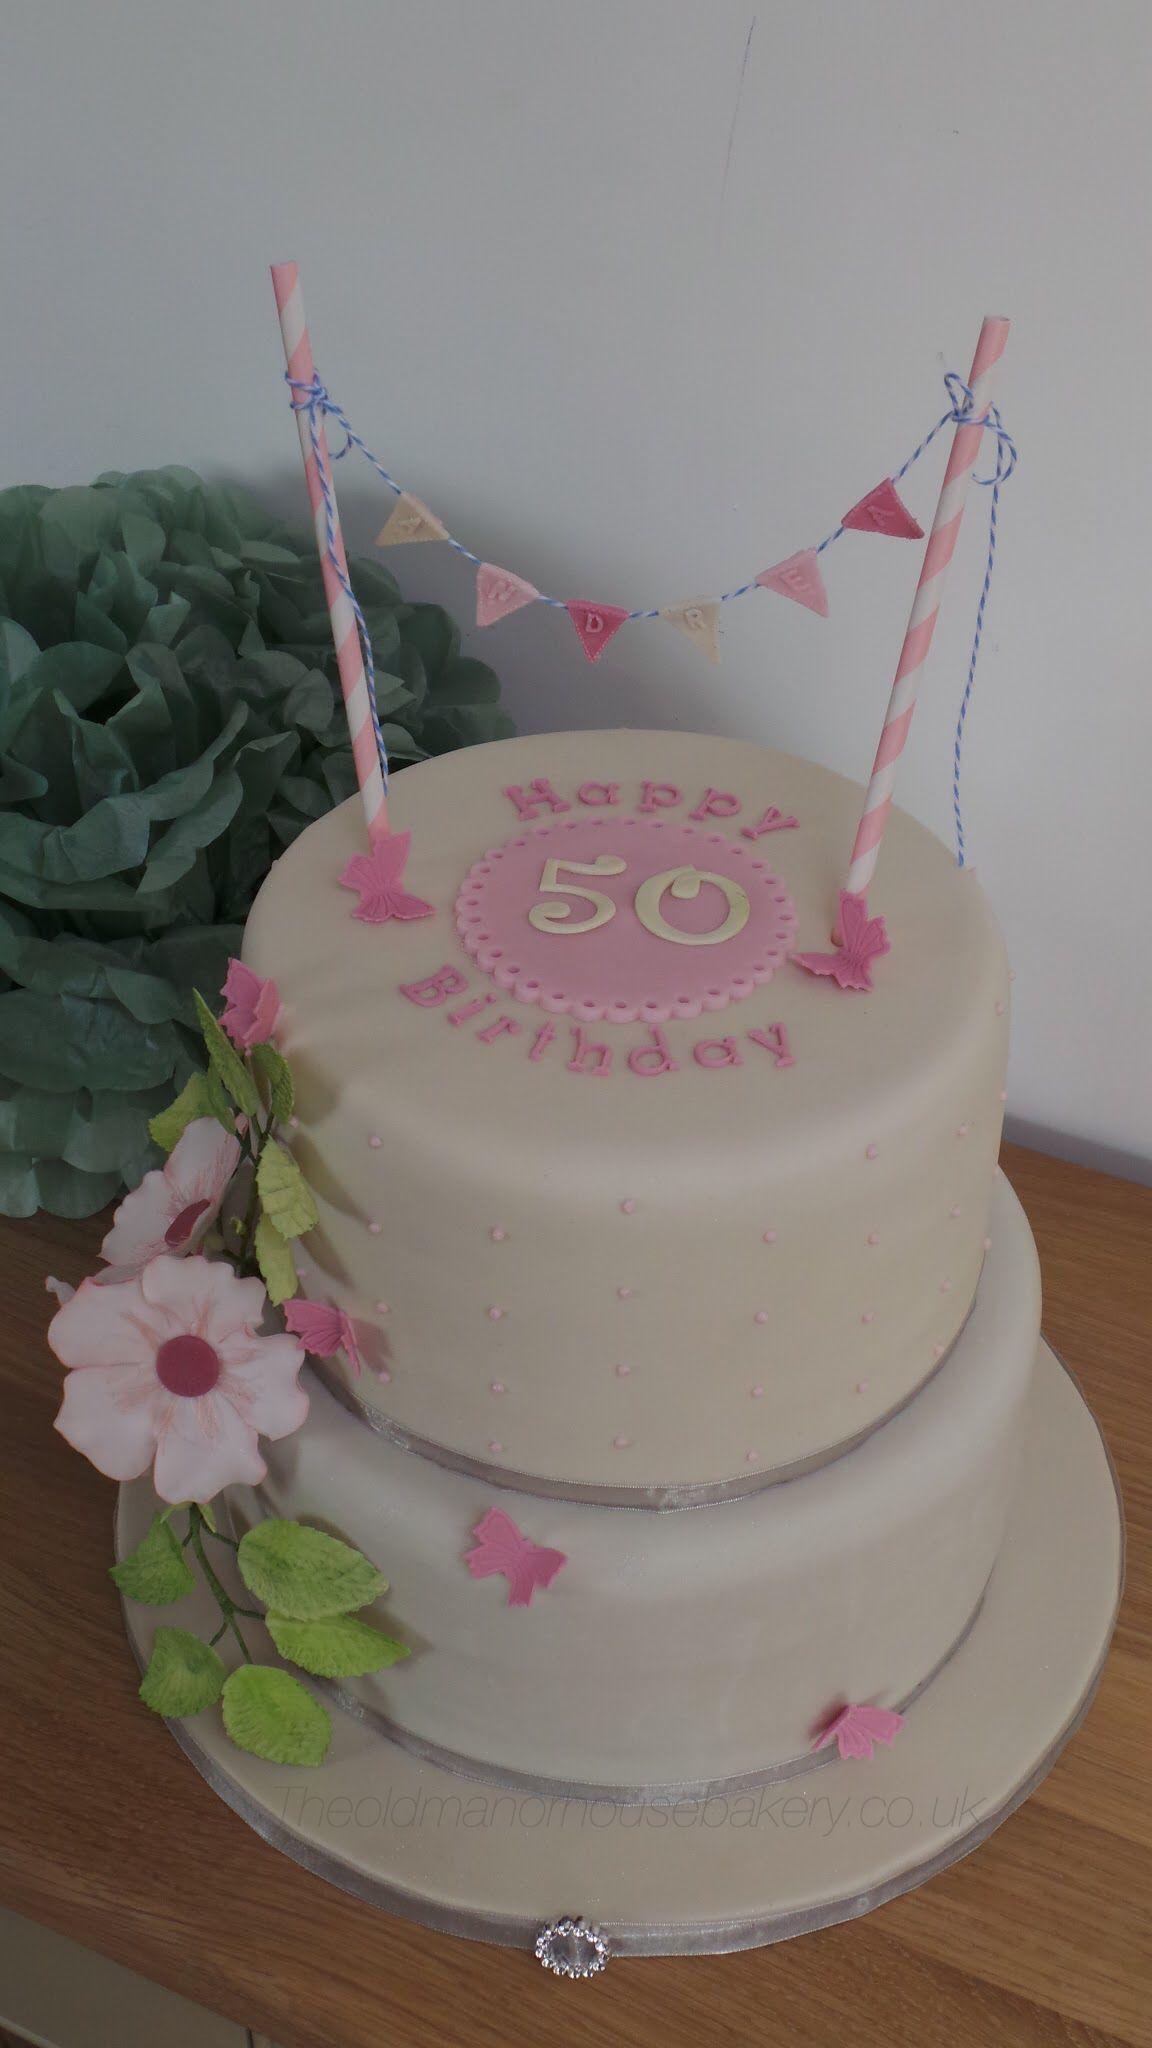 50th birthday cake decorations uk